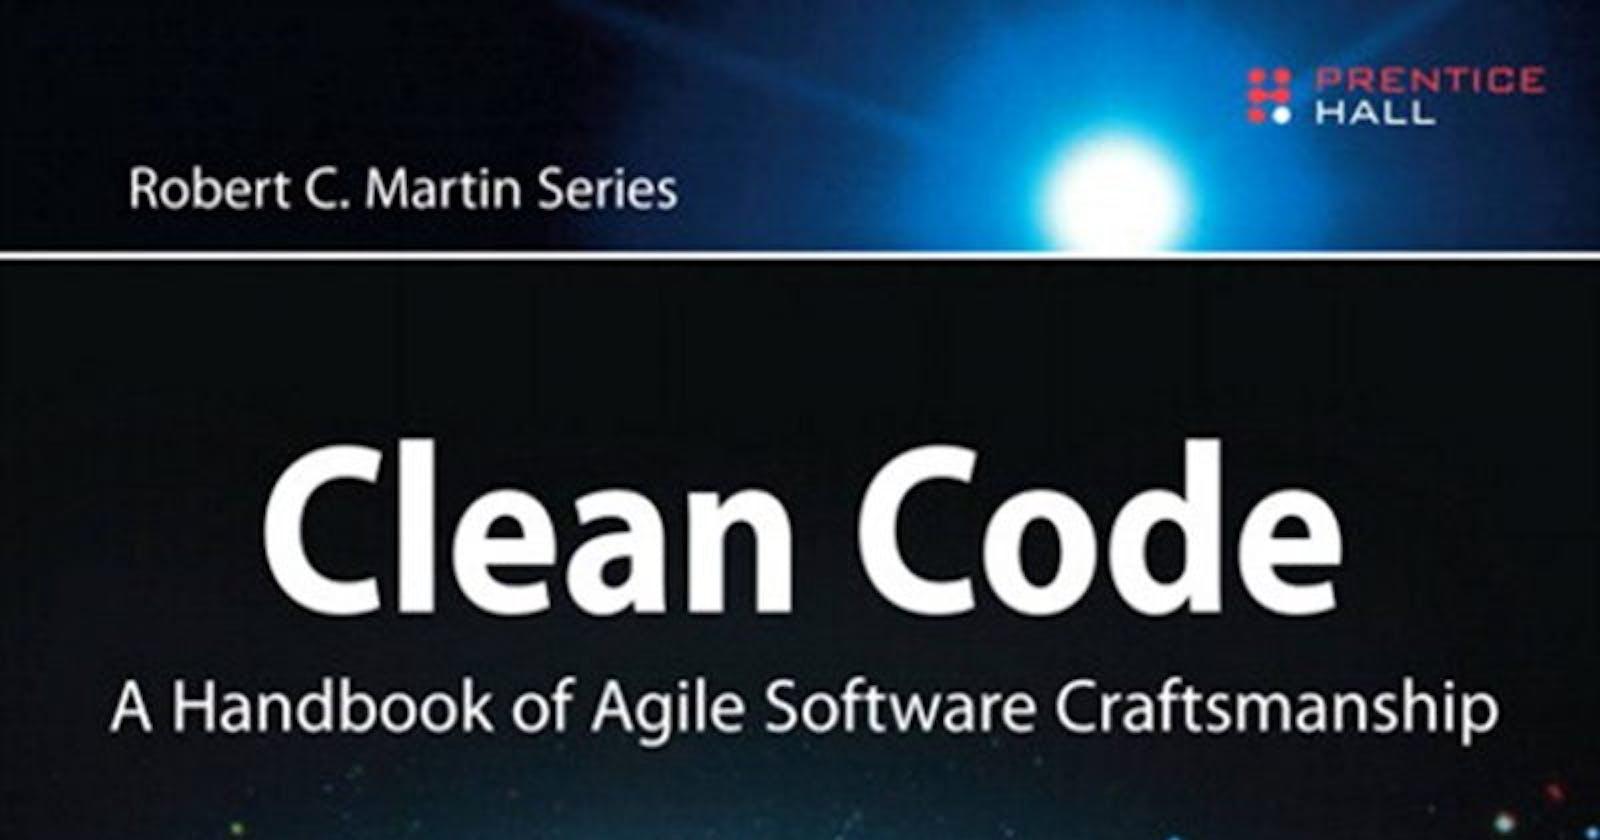 Clean Code by Robert C. Martin